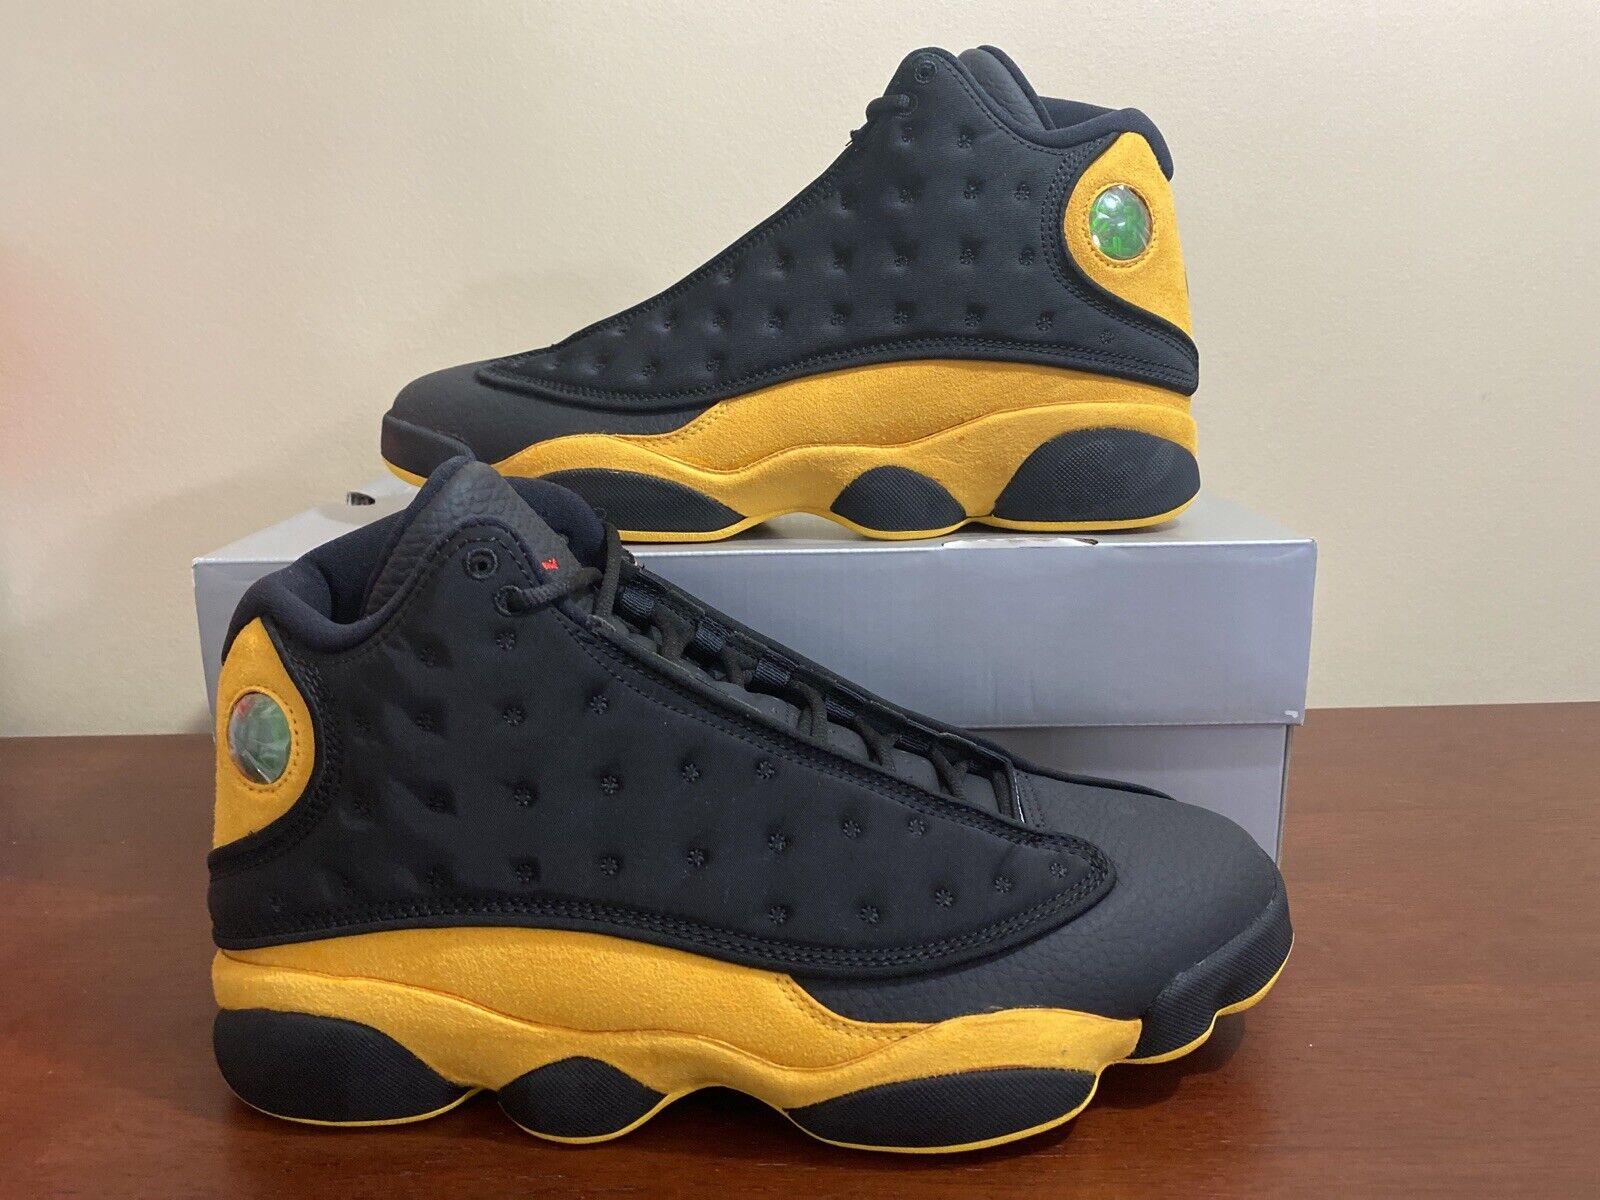 Size 10 - Jordan 13 Retro Melo Class of 2002 2018 for sale online ...